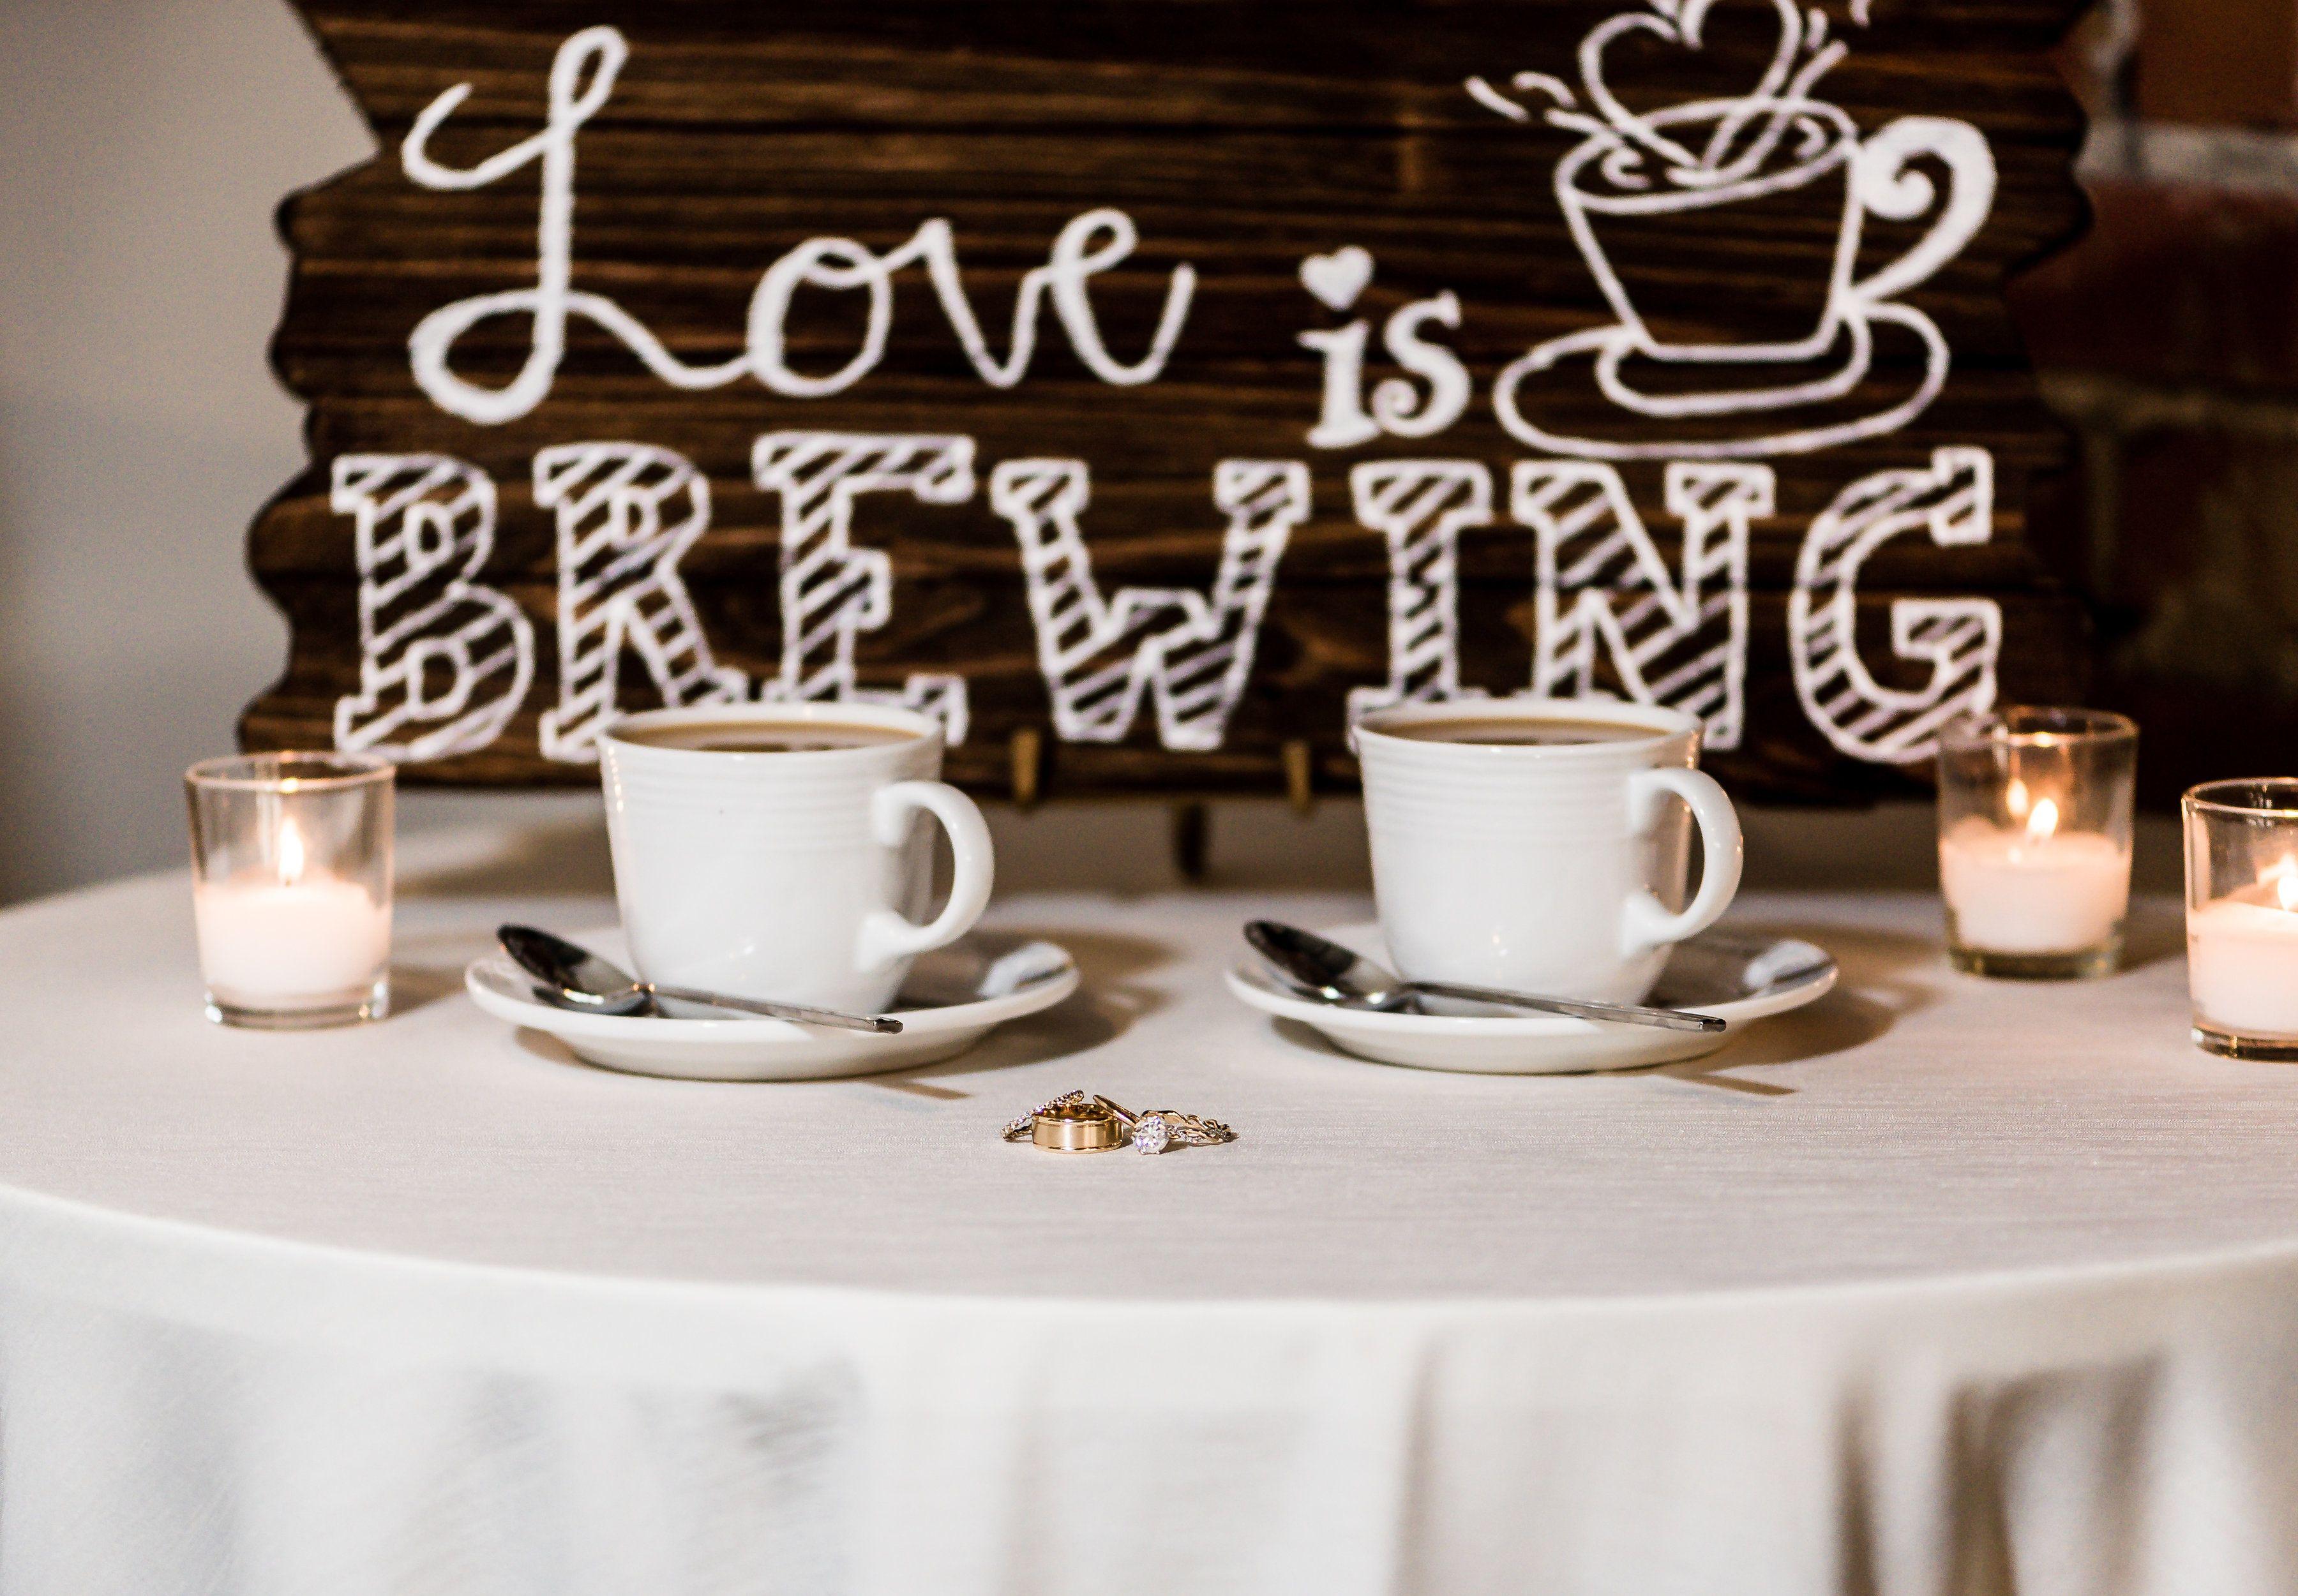 Romantic coffee wedding sign Photo Viktoriya Chuprov